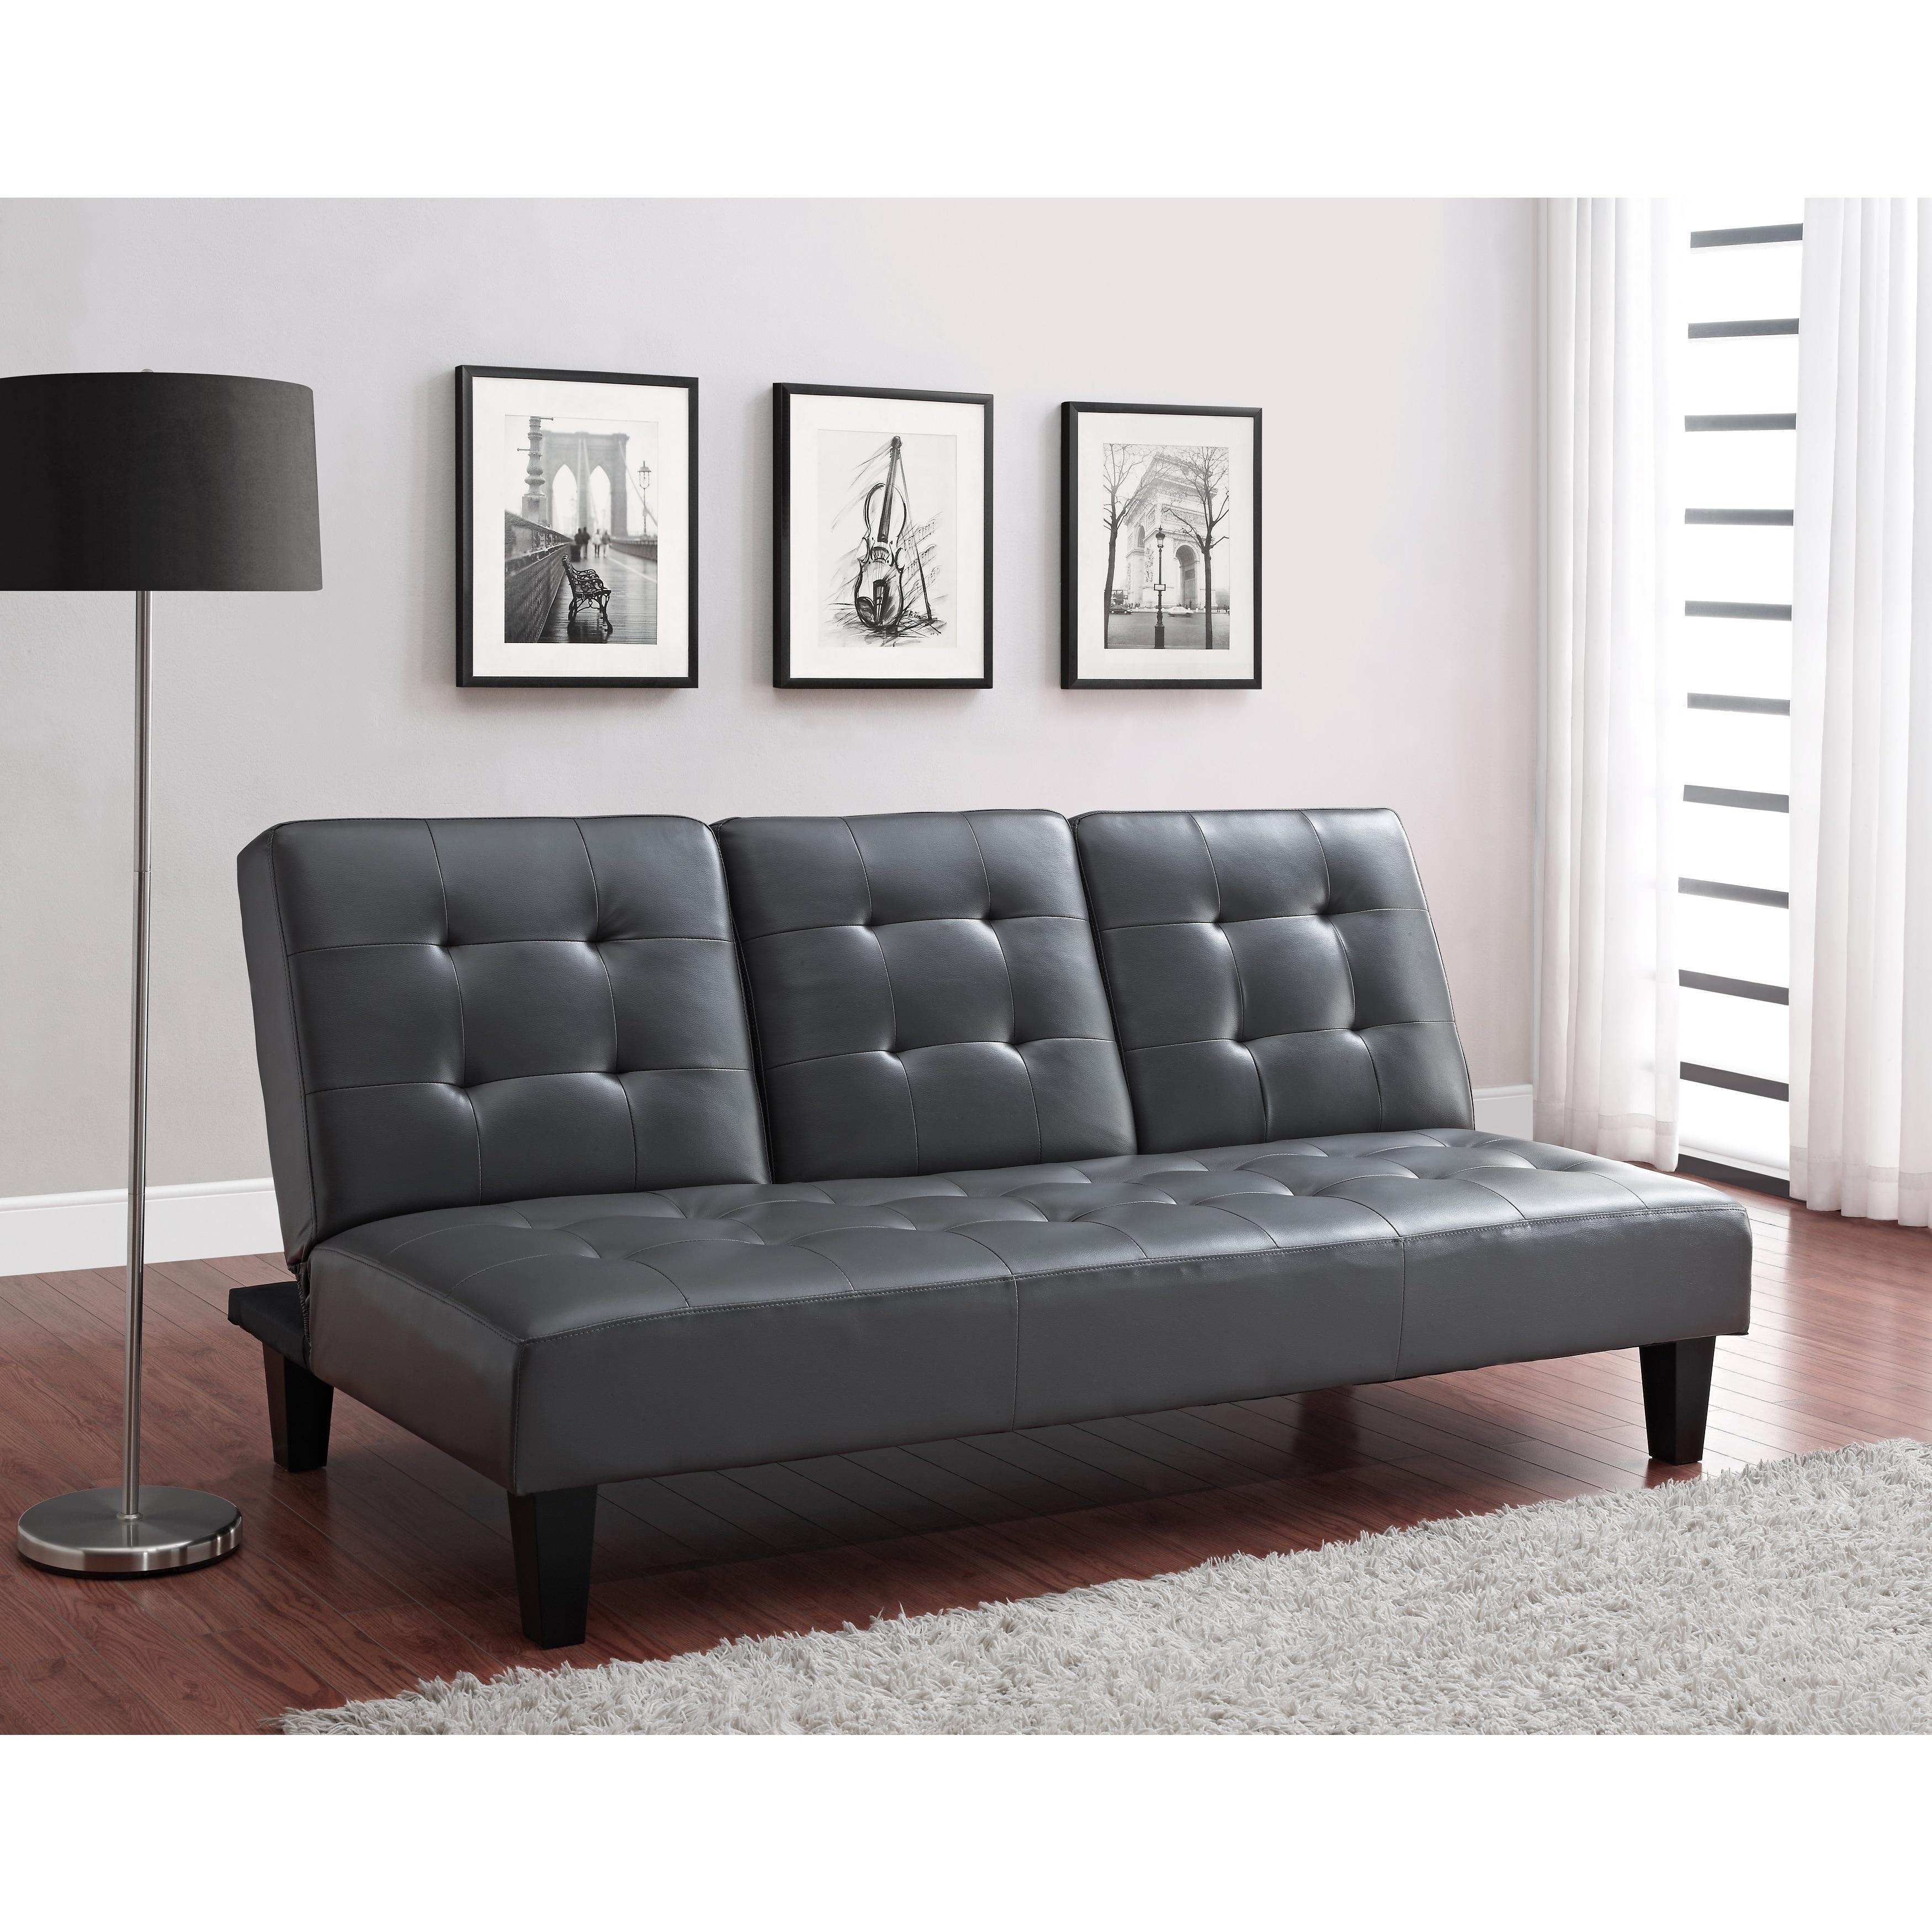 Avenue Greene Julia Cup Holder Convertible Futon Sofa Bed Free